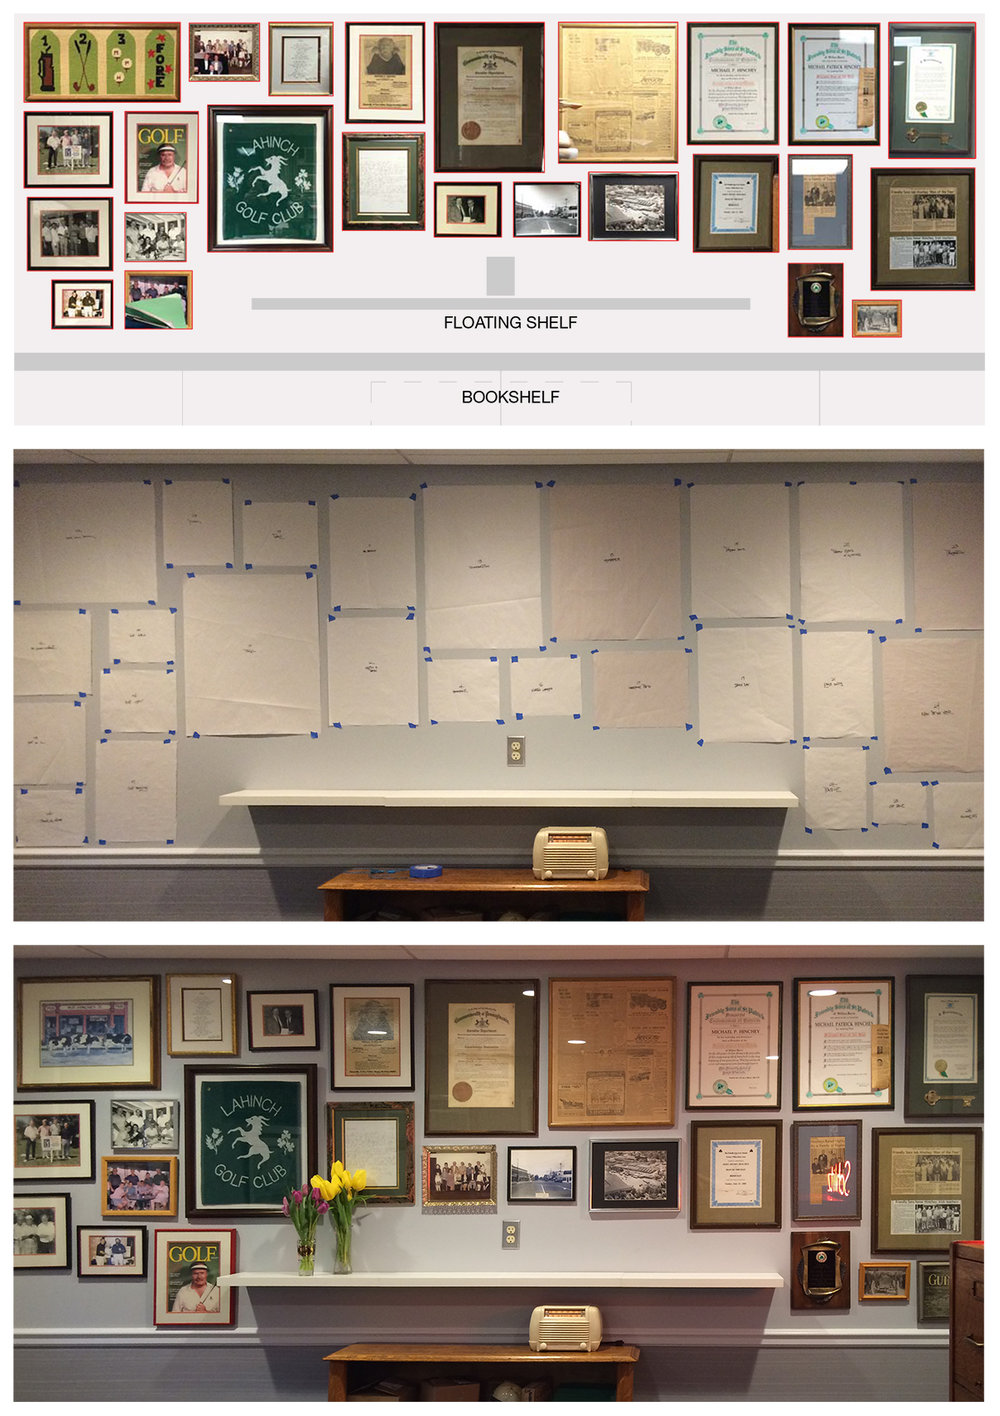 office_wall.jpg